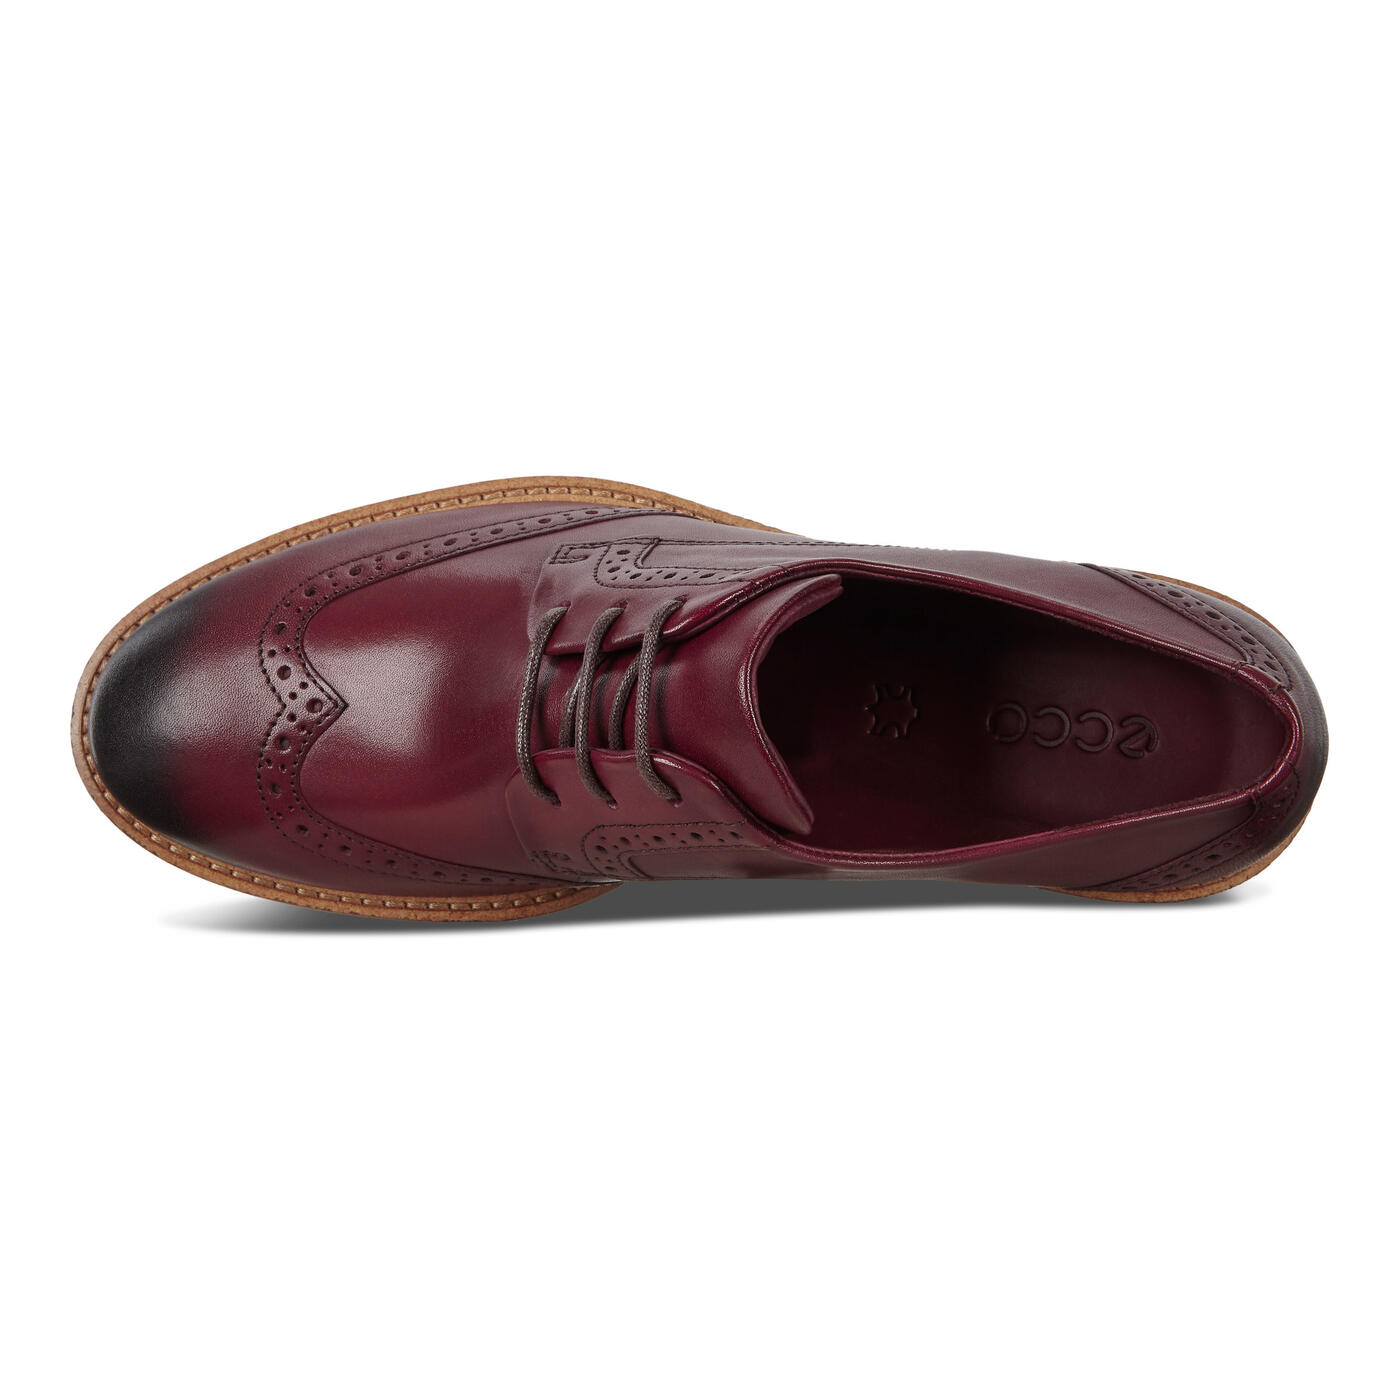 ECCO Sartorelle 25 Tailored Women's Shoe